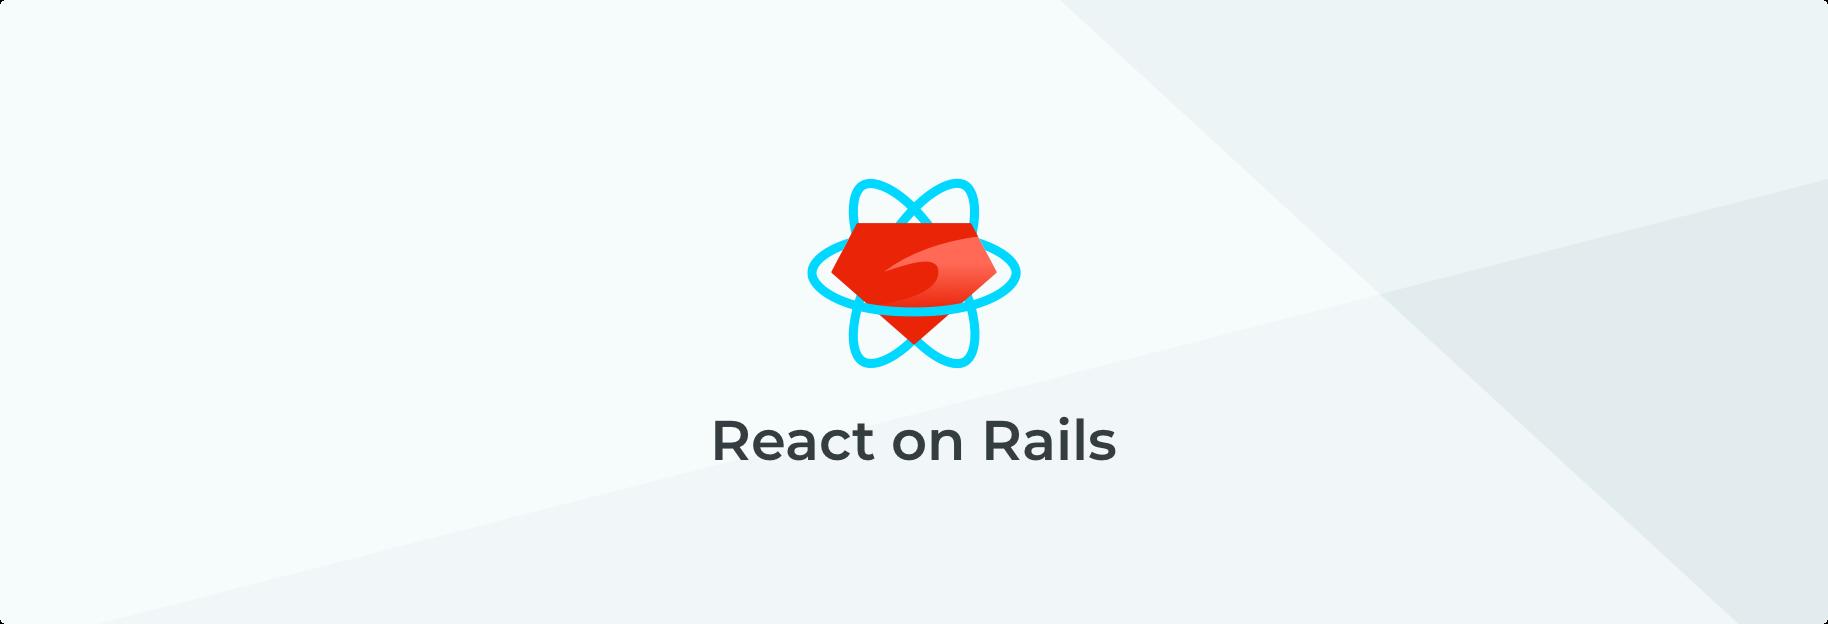 reactrails